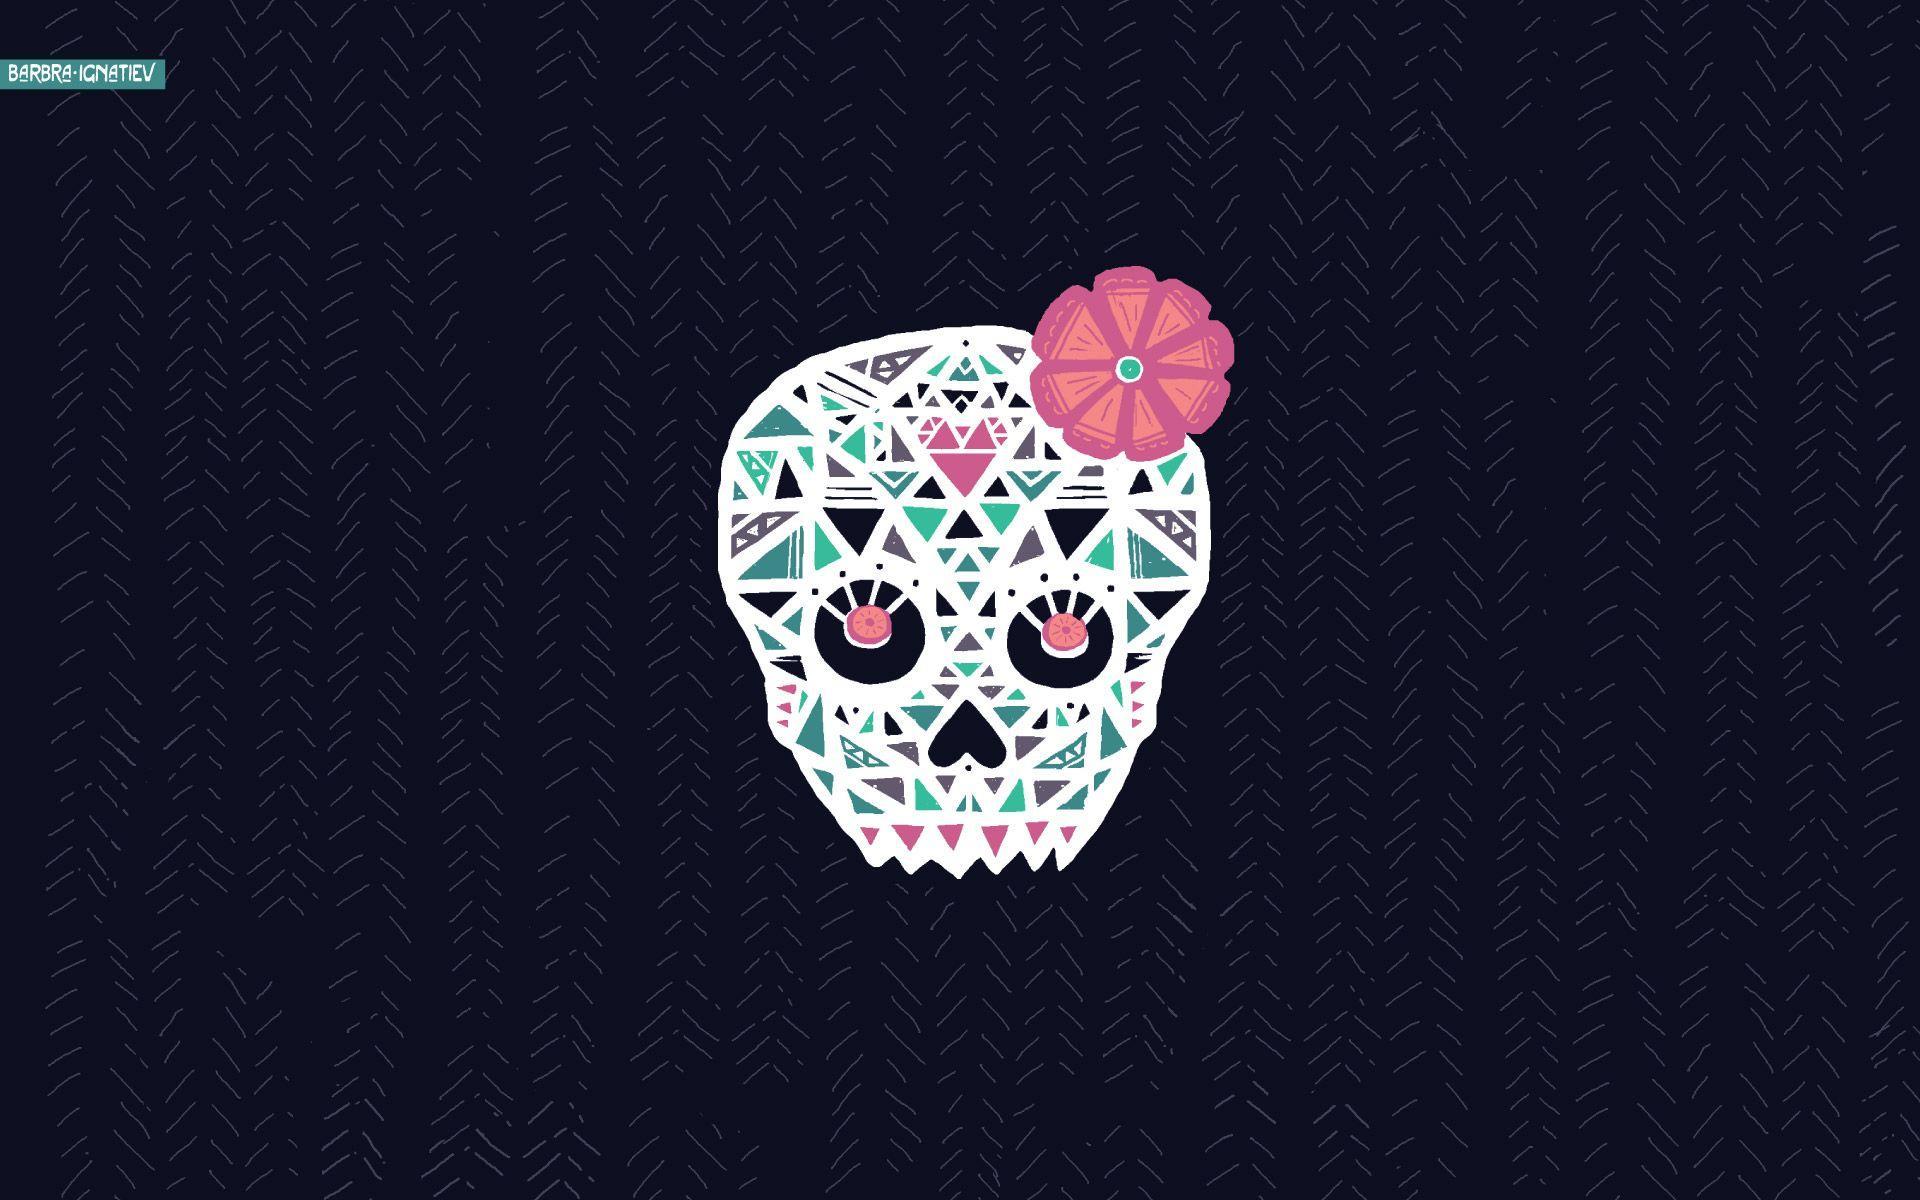 wallpapers skull desktop - photo #46